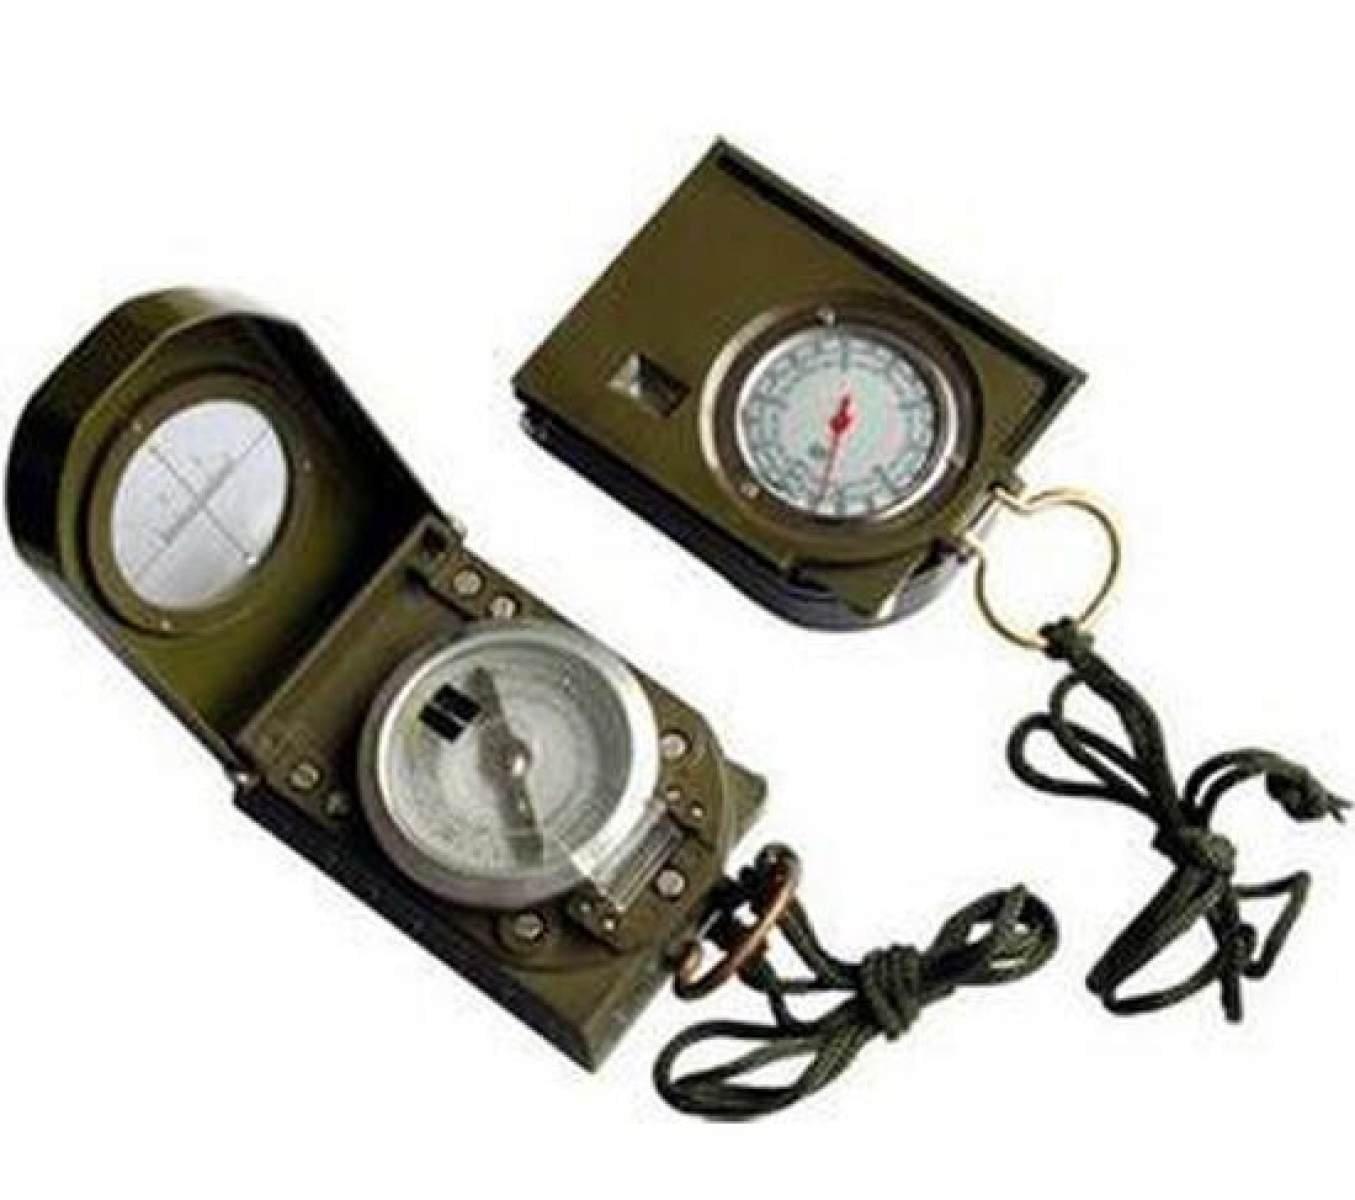 HWZNZ-HWSP Kompass Multifunktions - Kompass